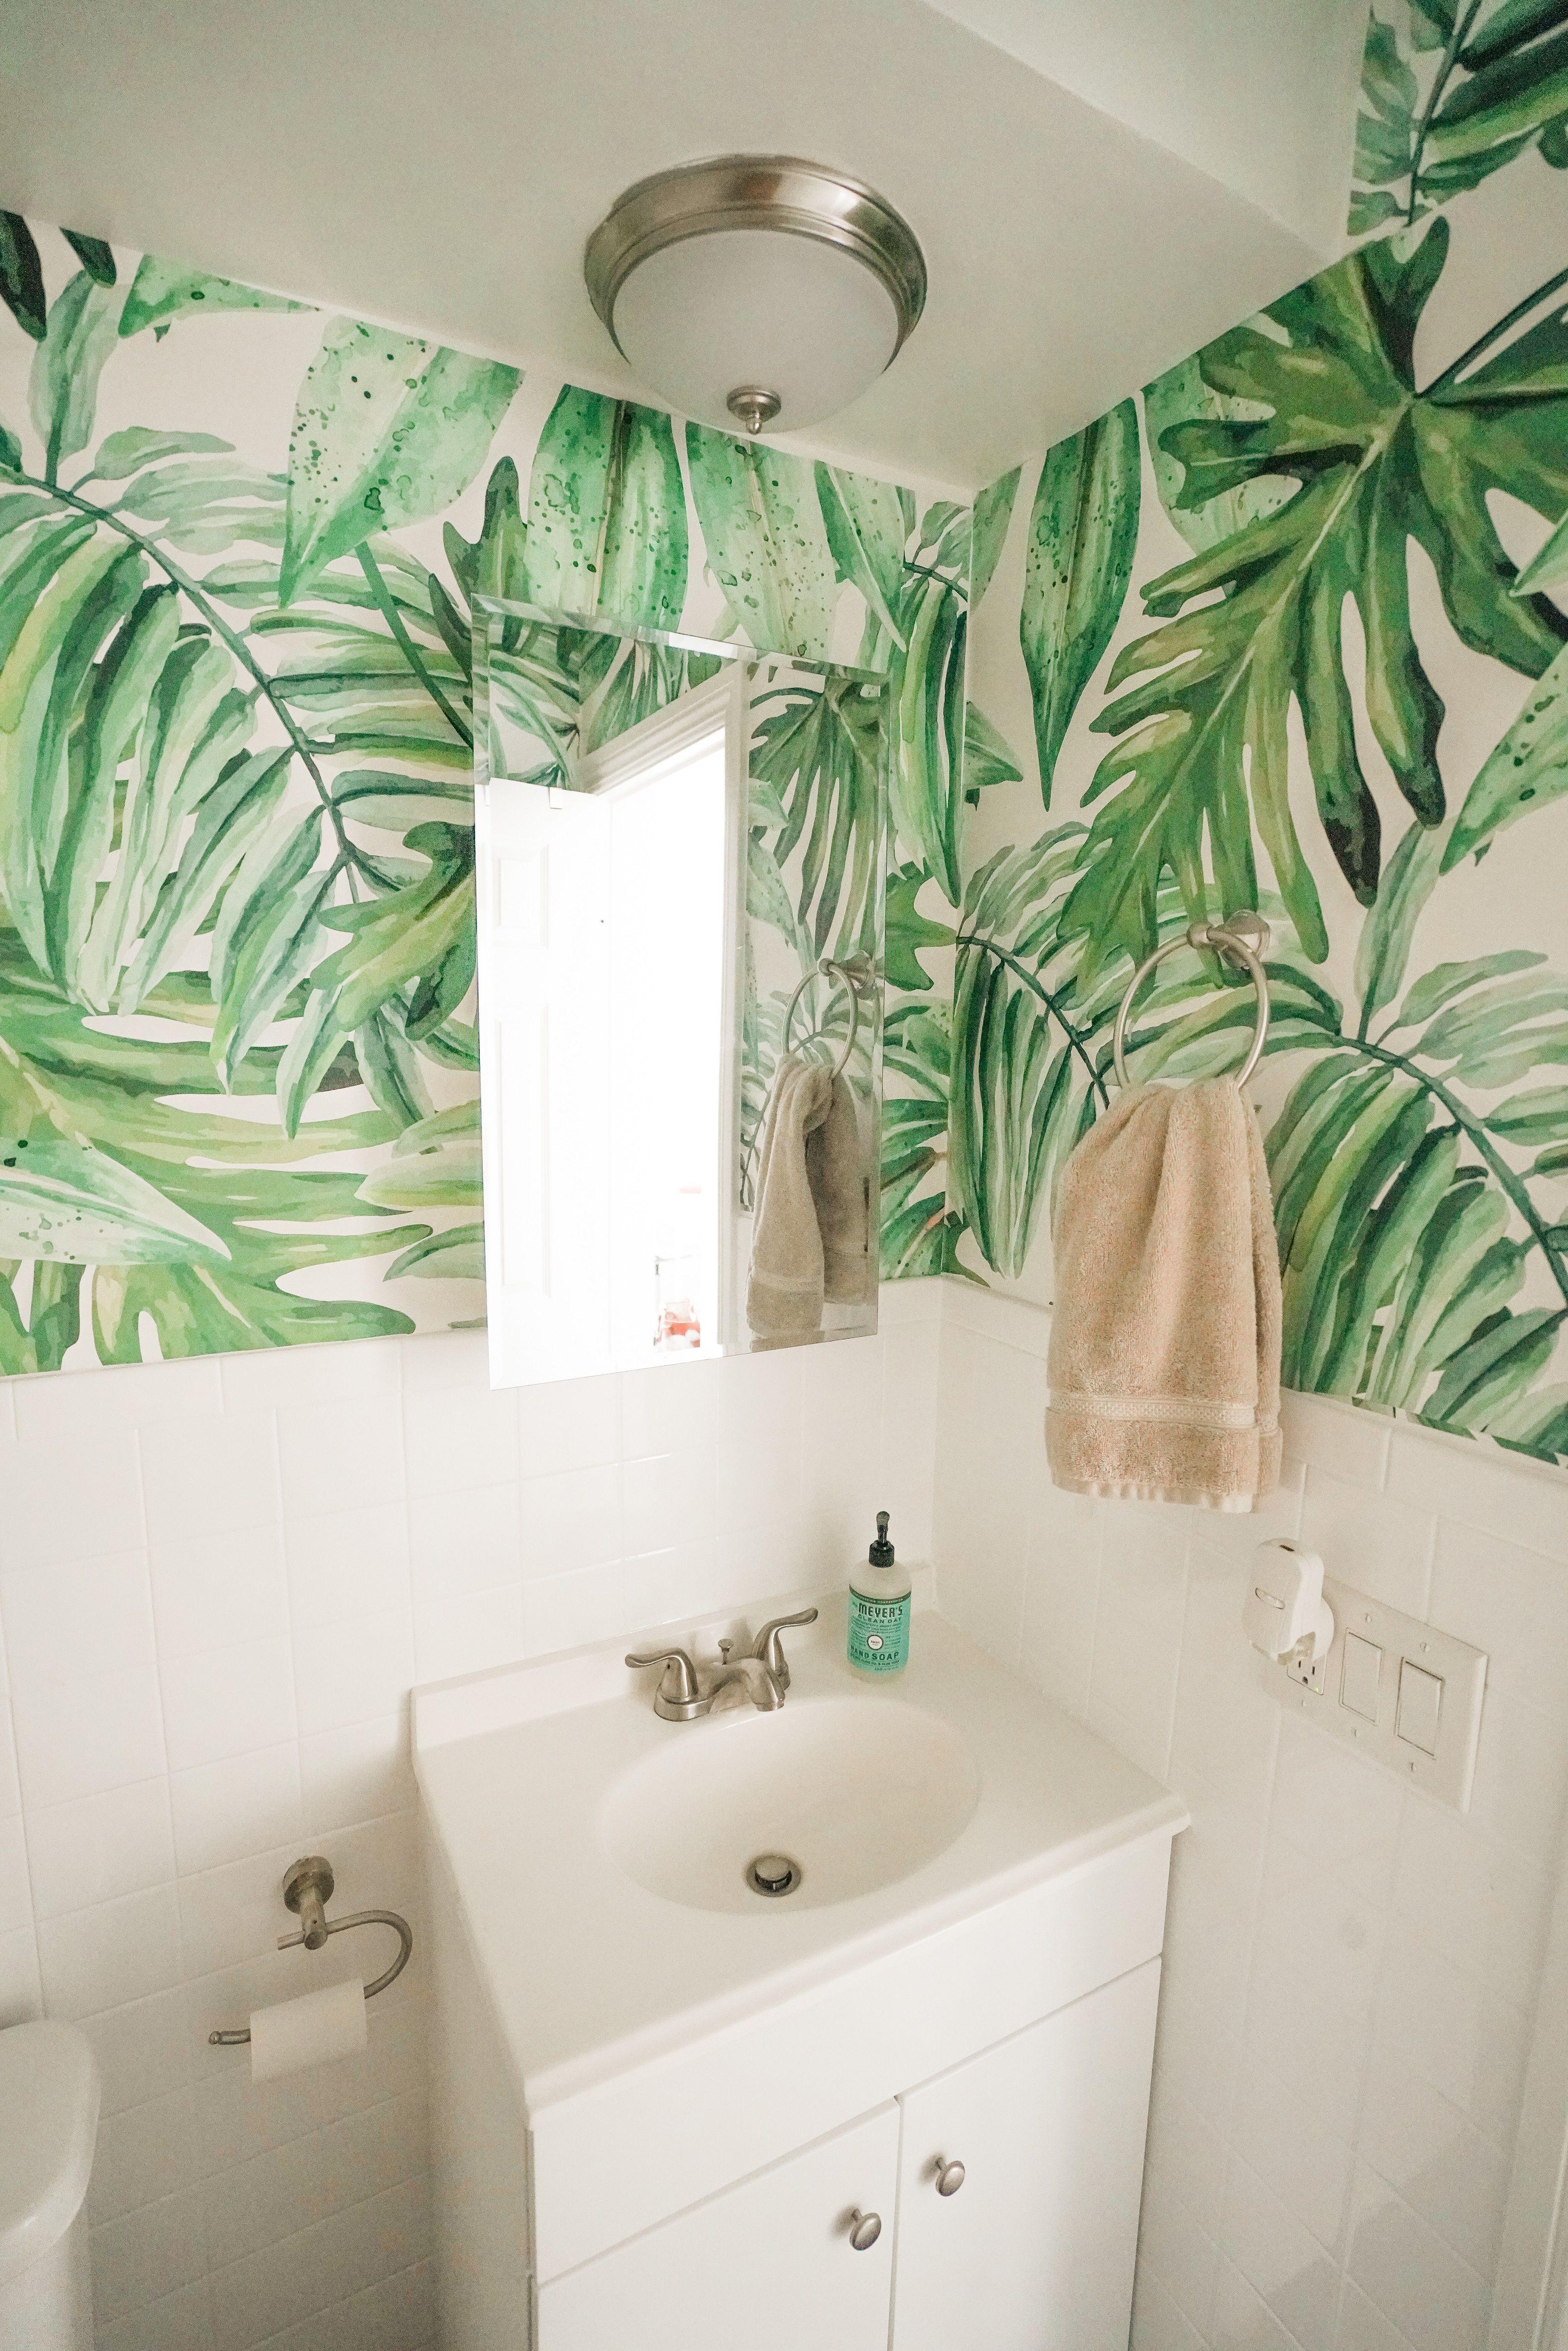 Greenery In Your Bathroom Zebra Bathroom Decor Palm Tree Bathroom Decor Bathroom Decor Zebra bathroom wall decor